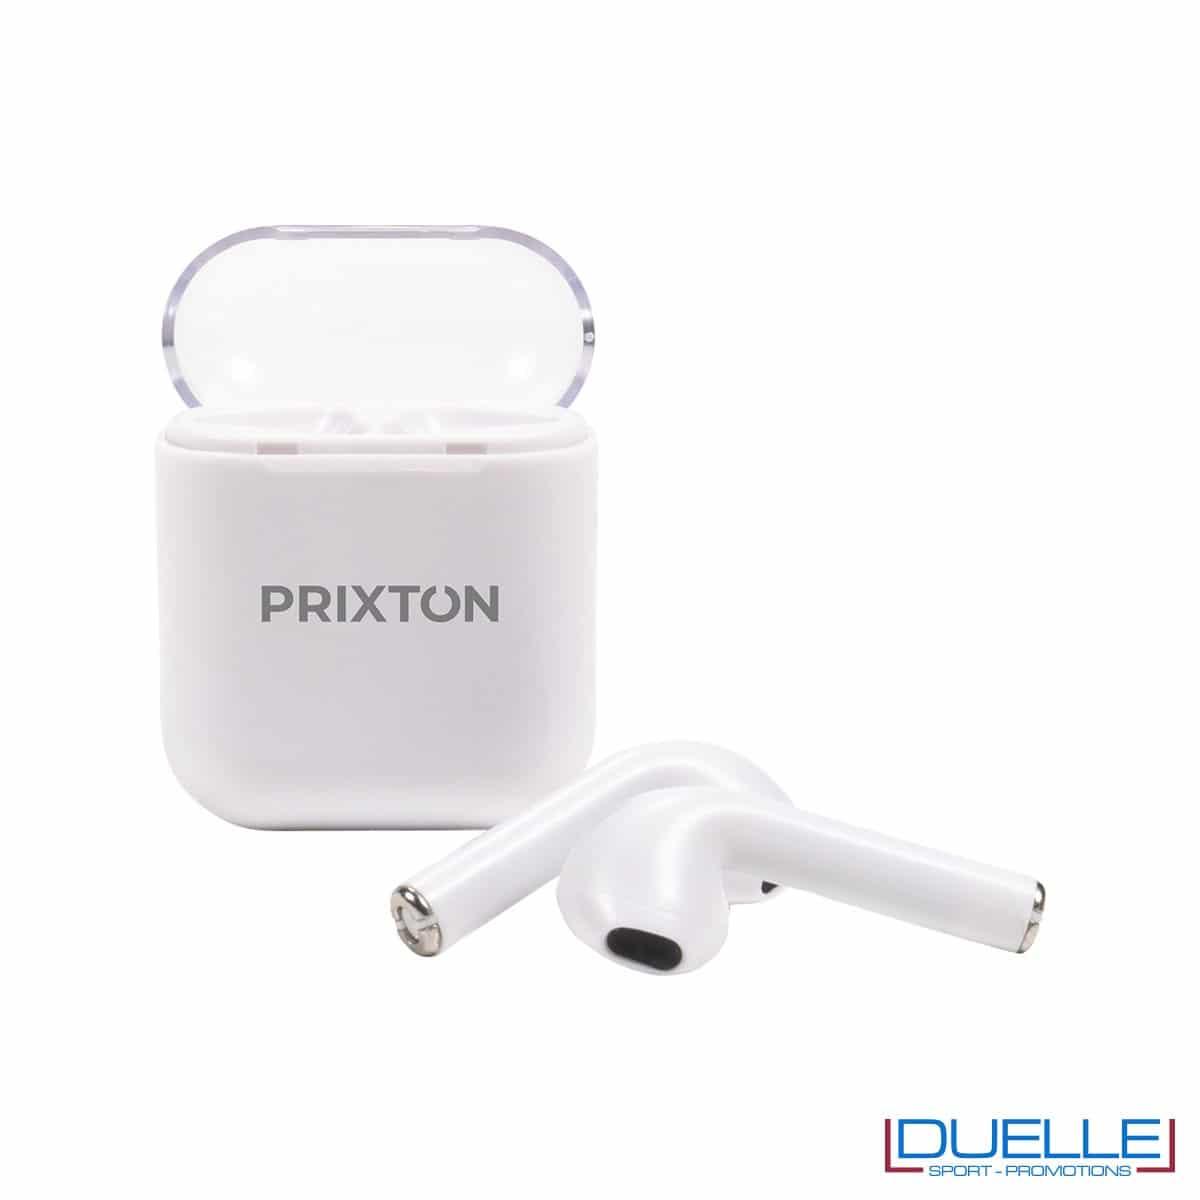 Earbuds bluetooth 5.0 Prixton con base di ricarica magnetica